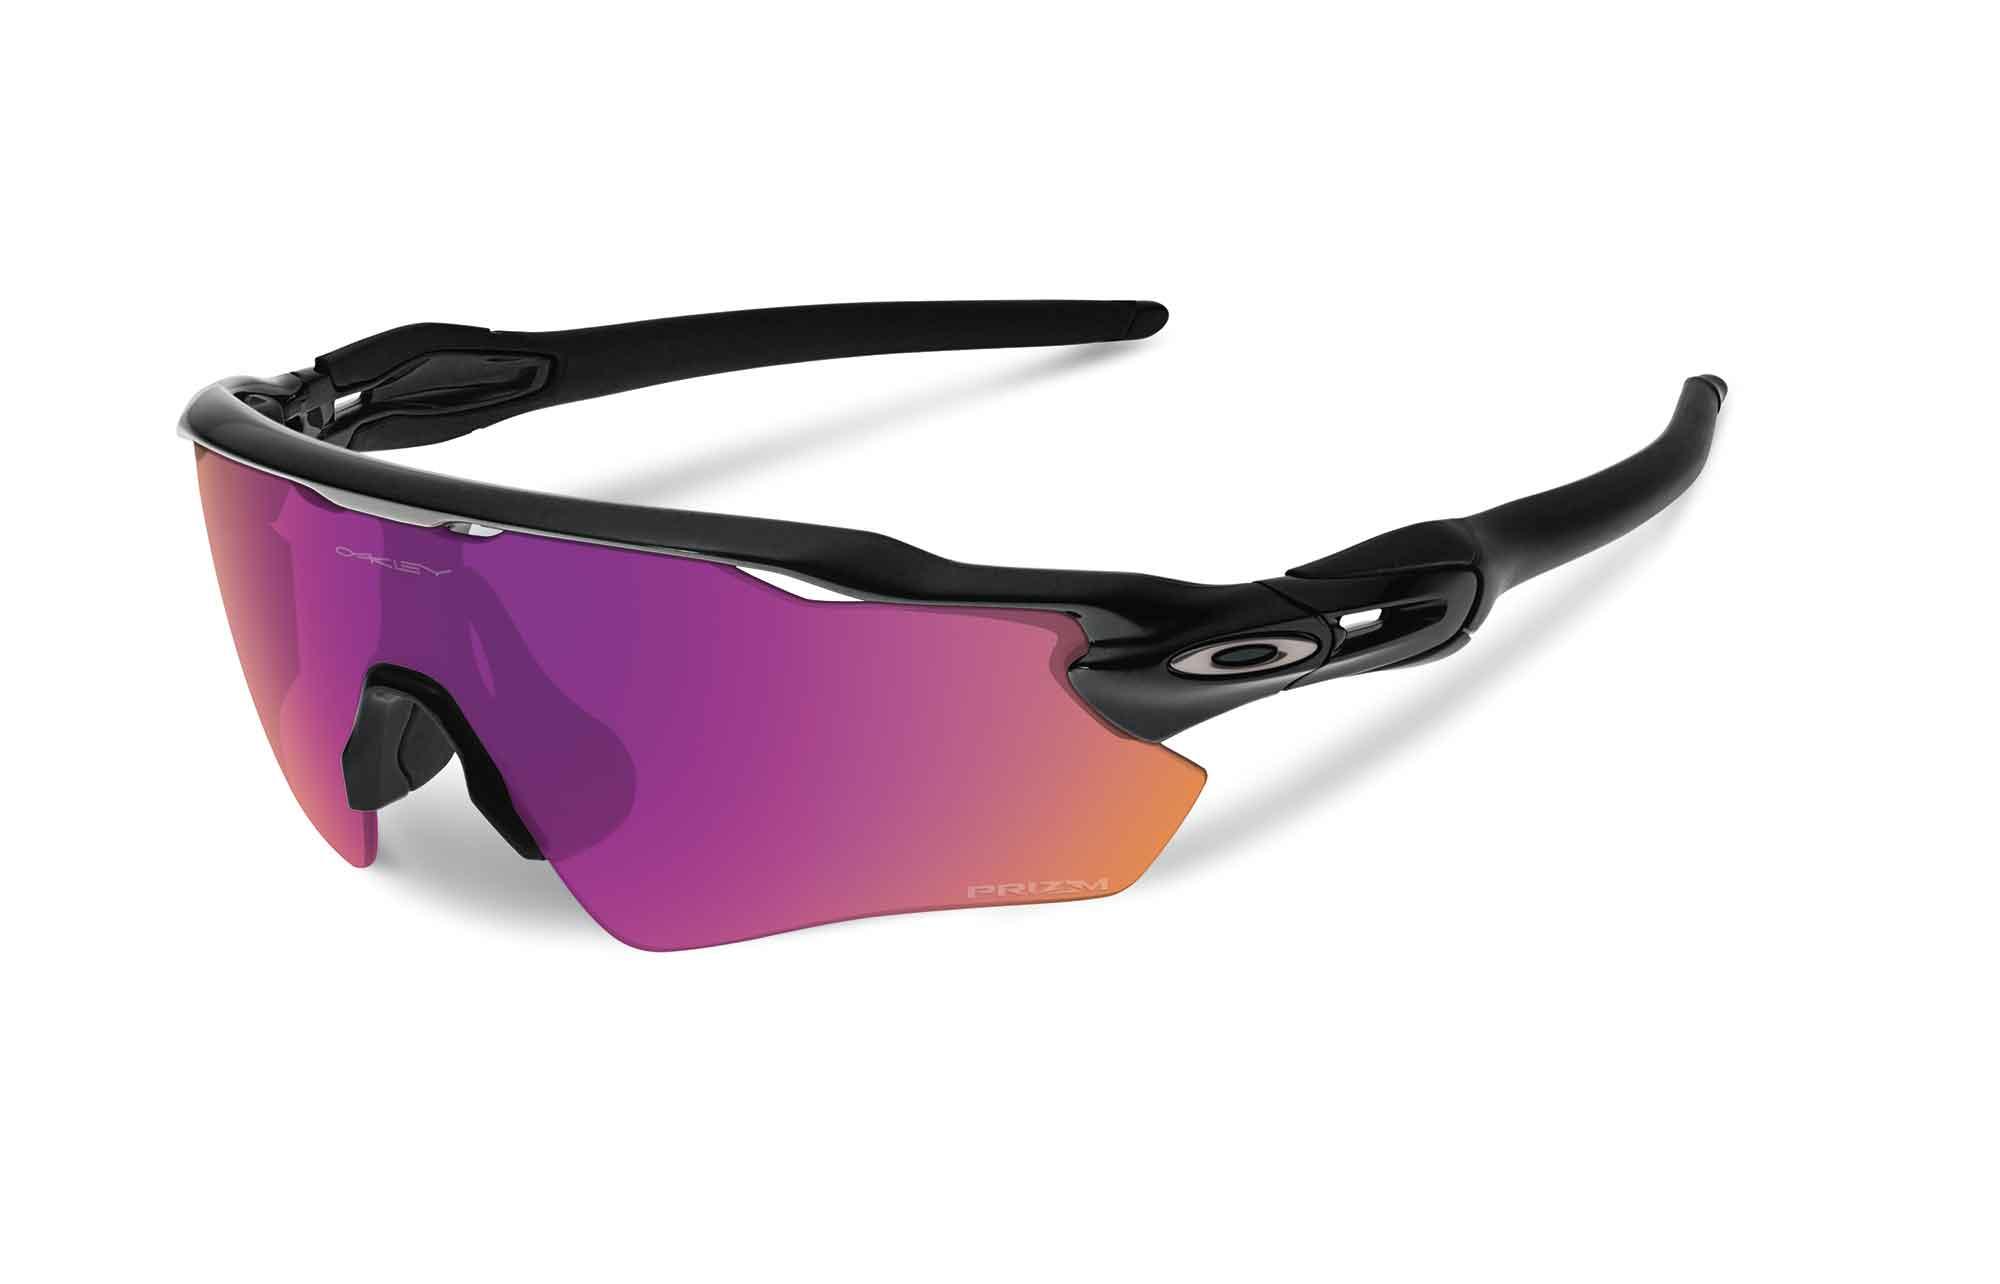 Oakley Jawbreaker Prizm >> Oakley Prizm Trail Radar EV Path Glasses | R&A Cycles